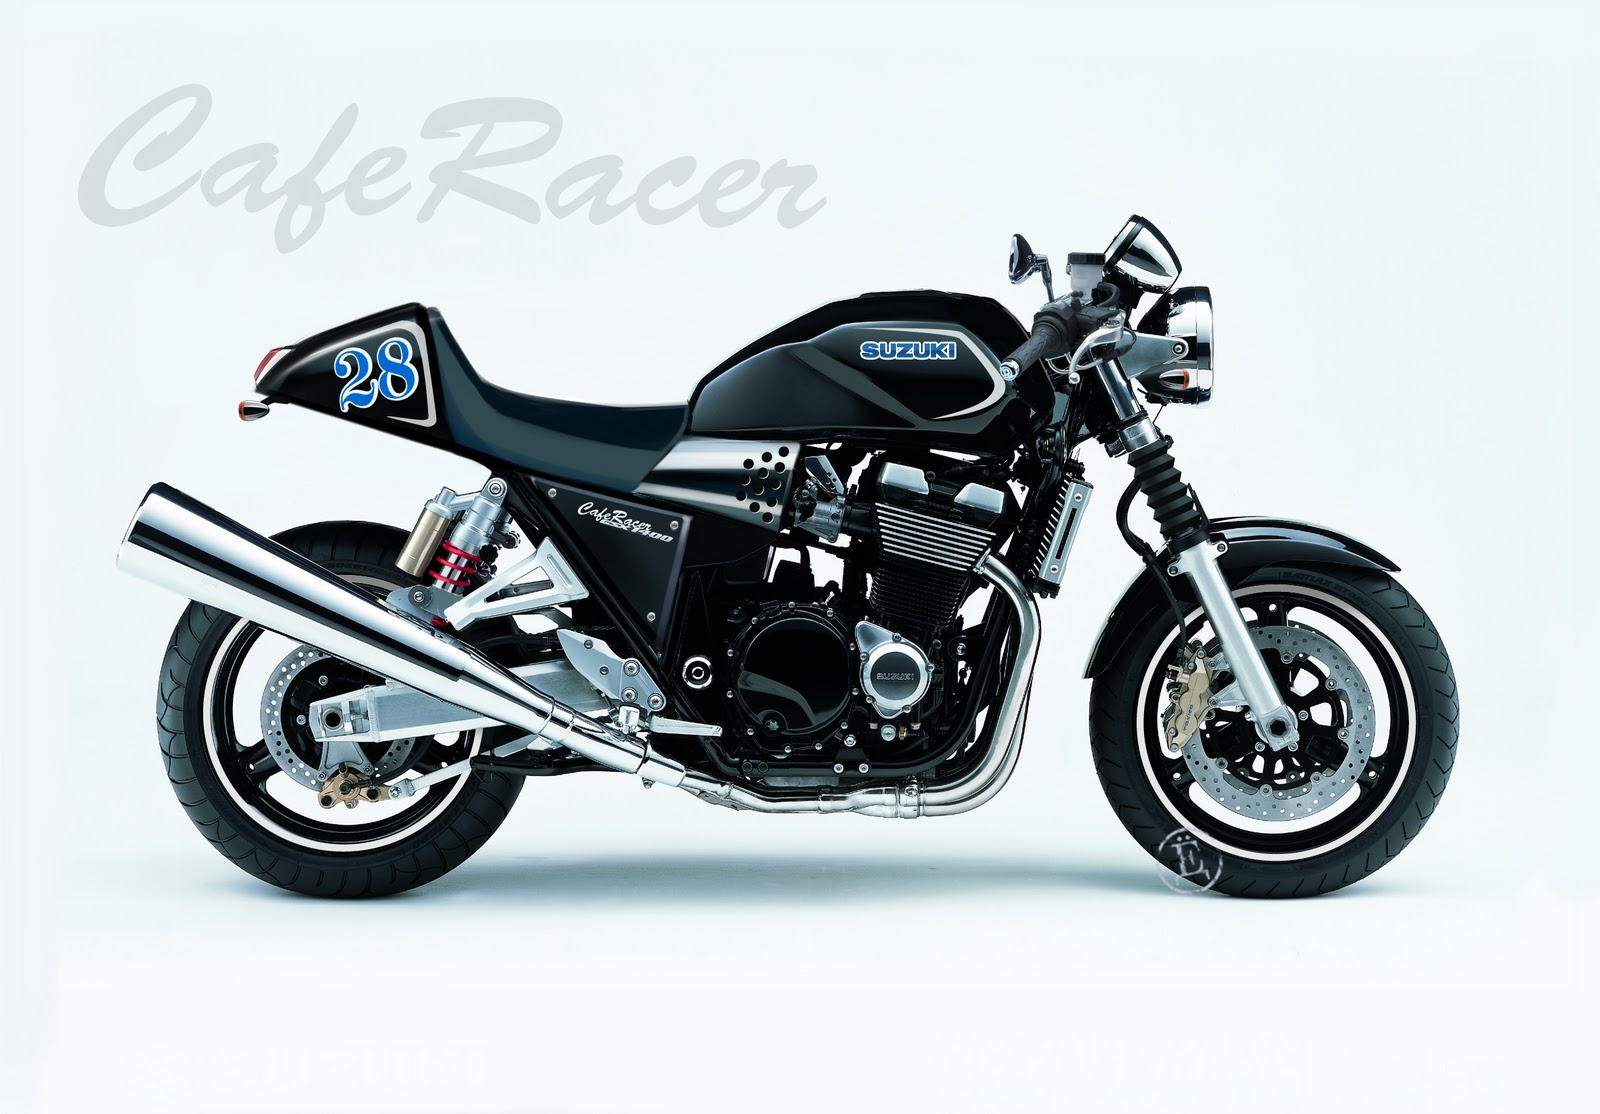 Yamaha Cafe Racer Concept Cafe Racer Concept